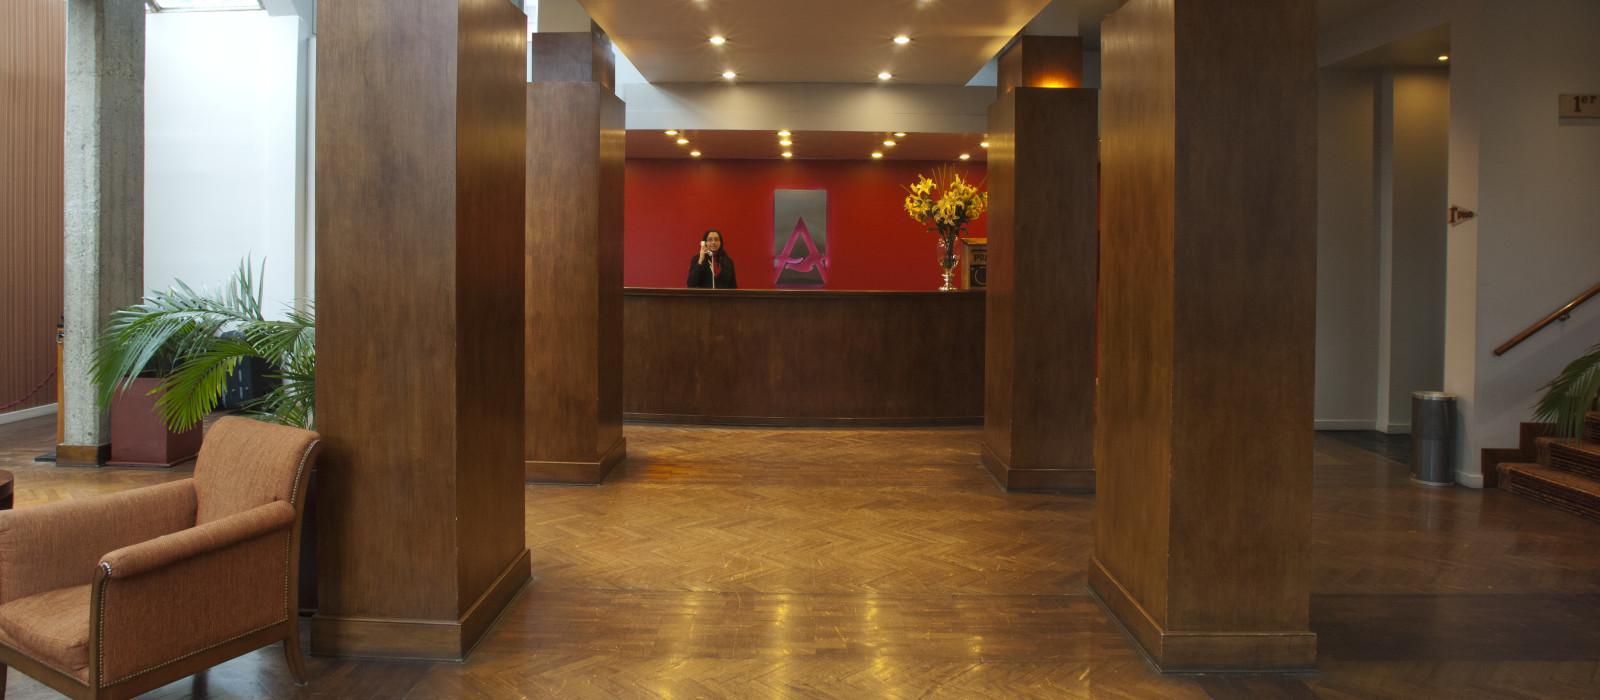 Hotel Albatros  Argentinien